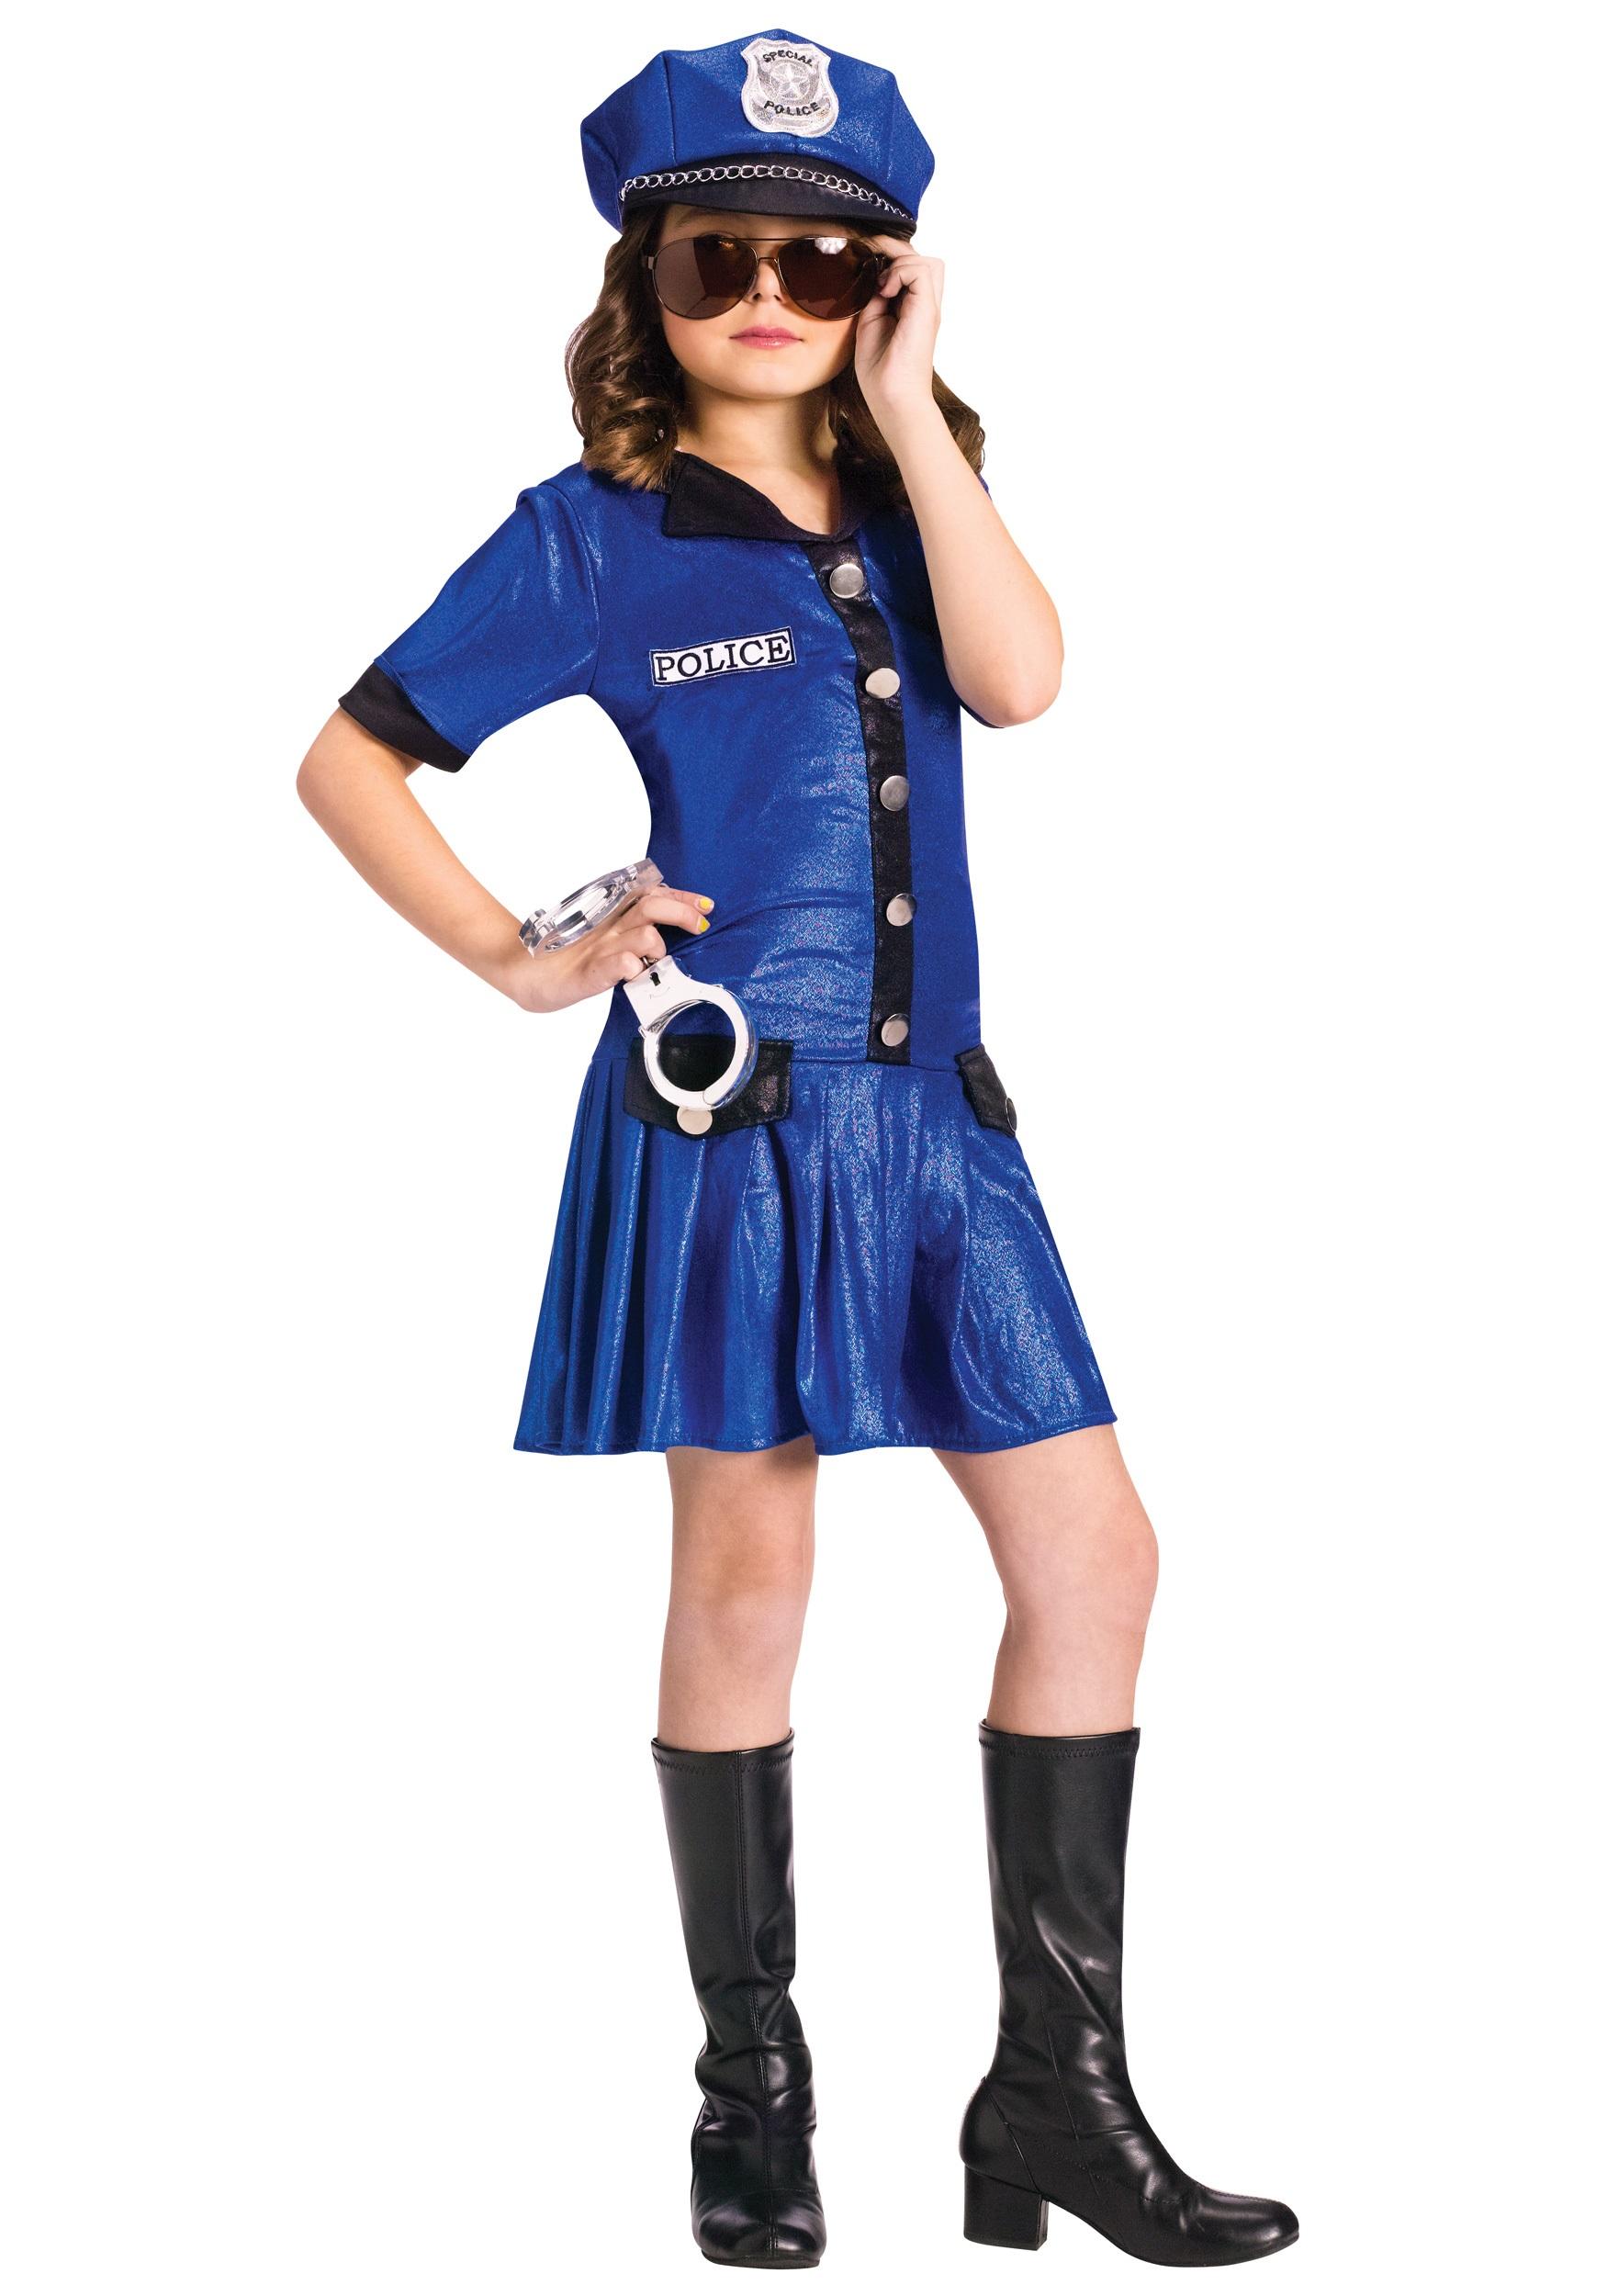 Kids Sassy Police Officer Costume  sc 1 st  Fun.com & Girls Sassy Police Officer Costume